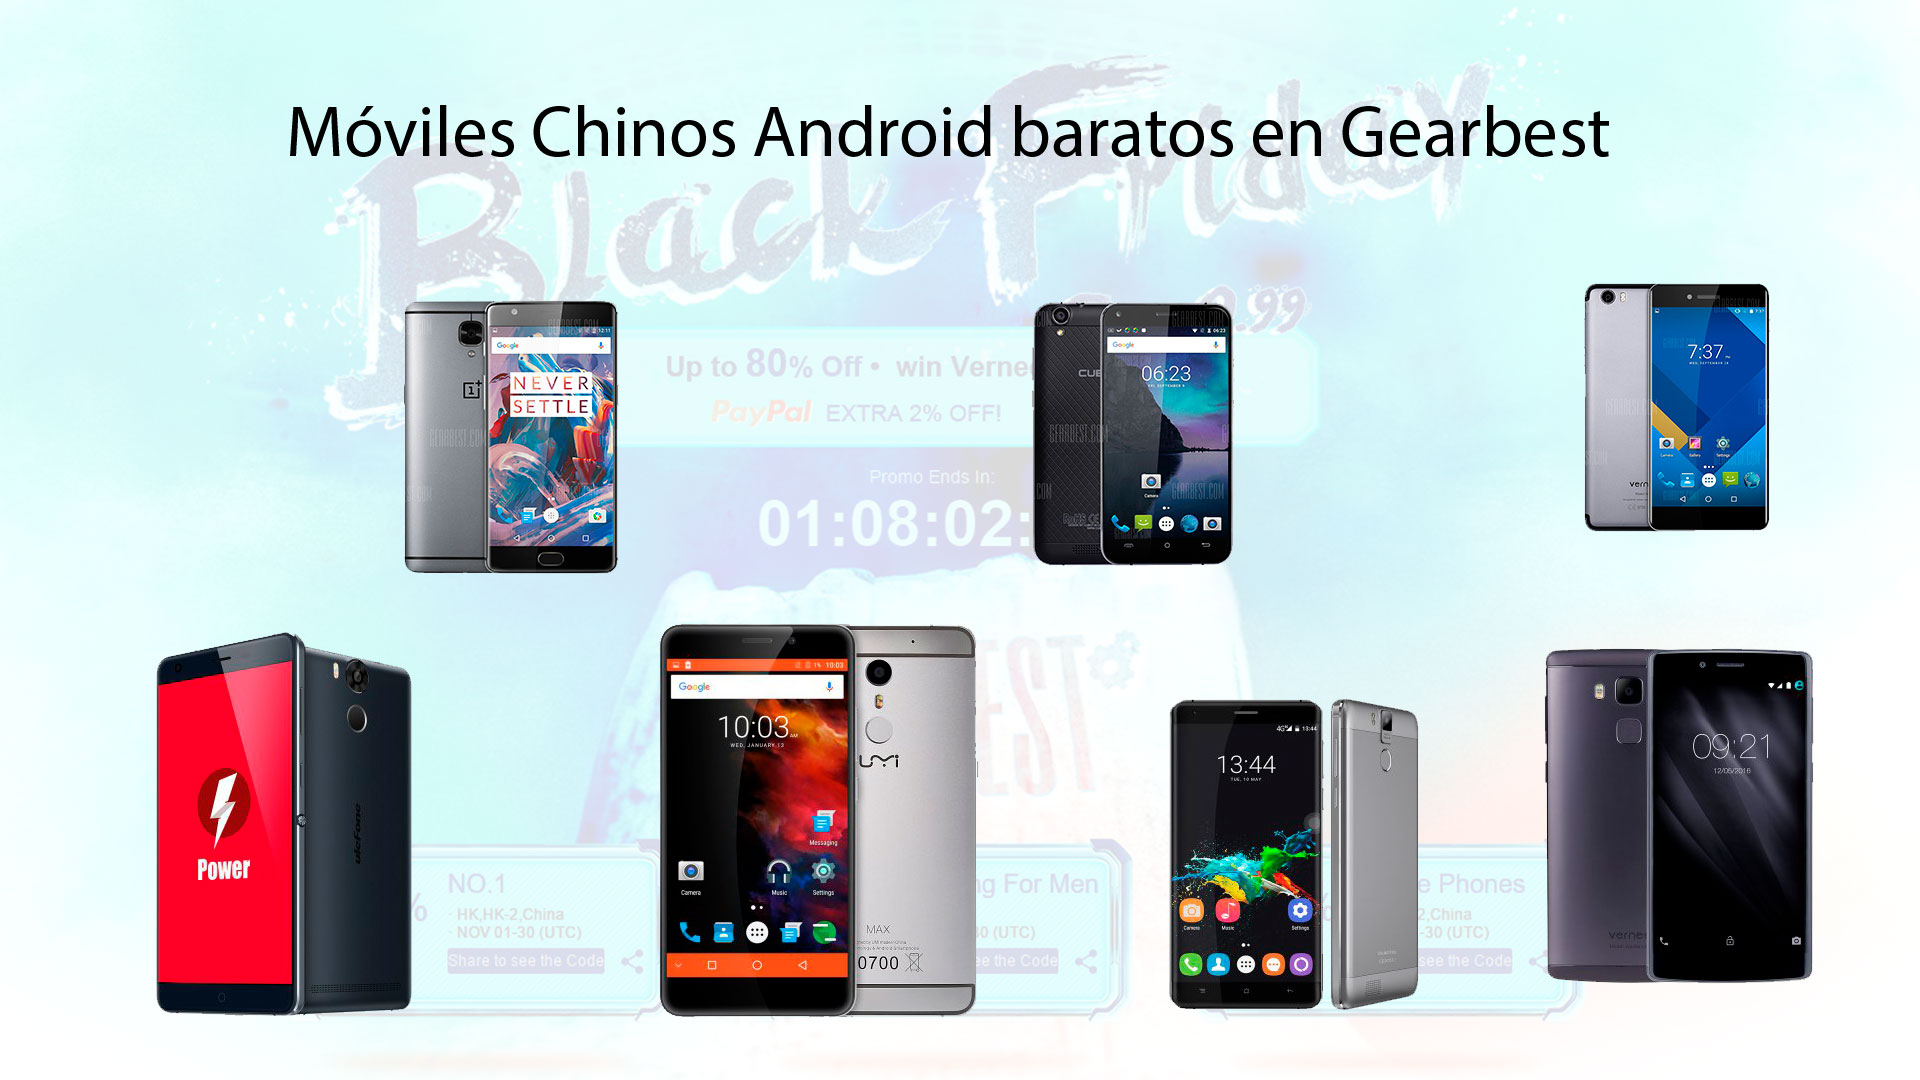 Móviles Chinos Android baratos en Gearbest